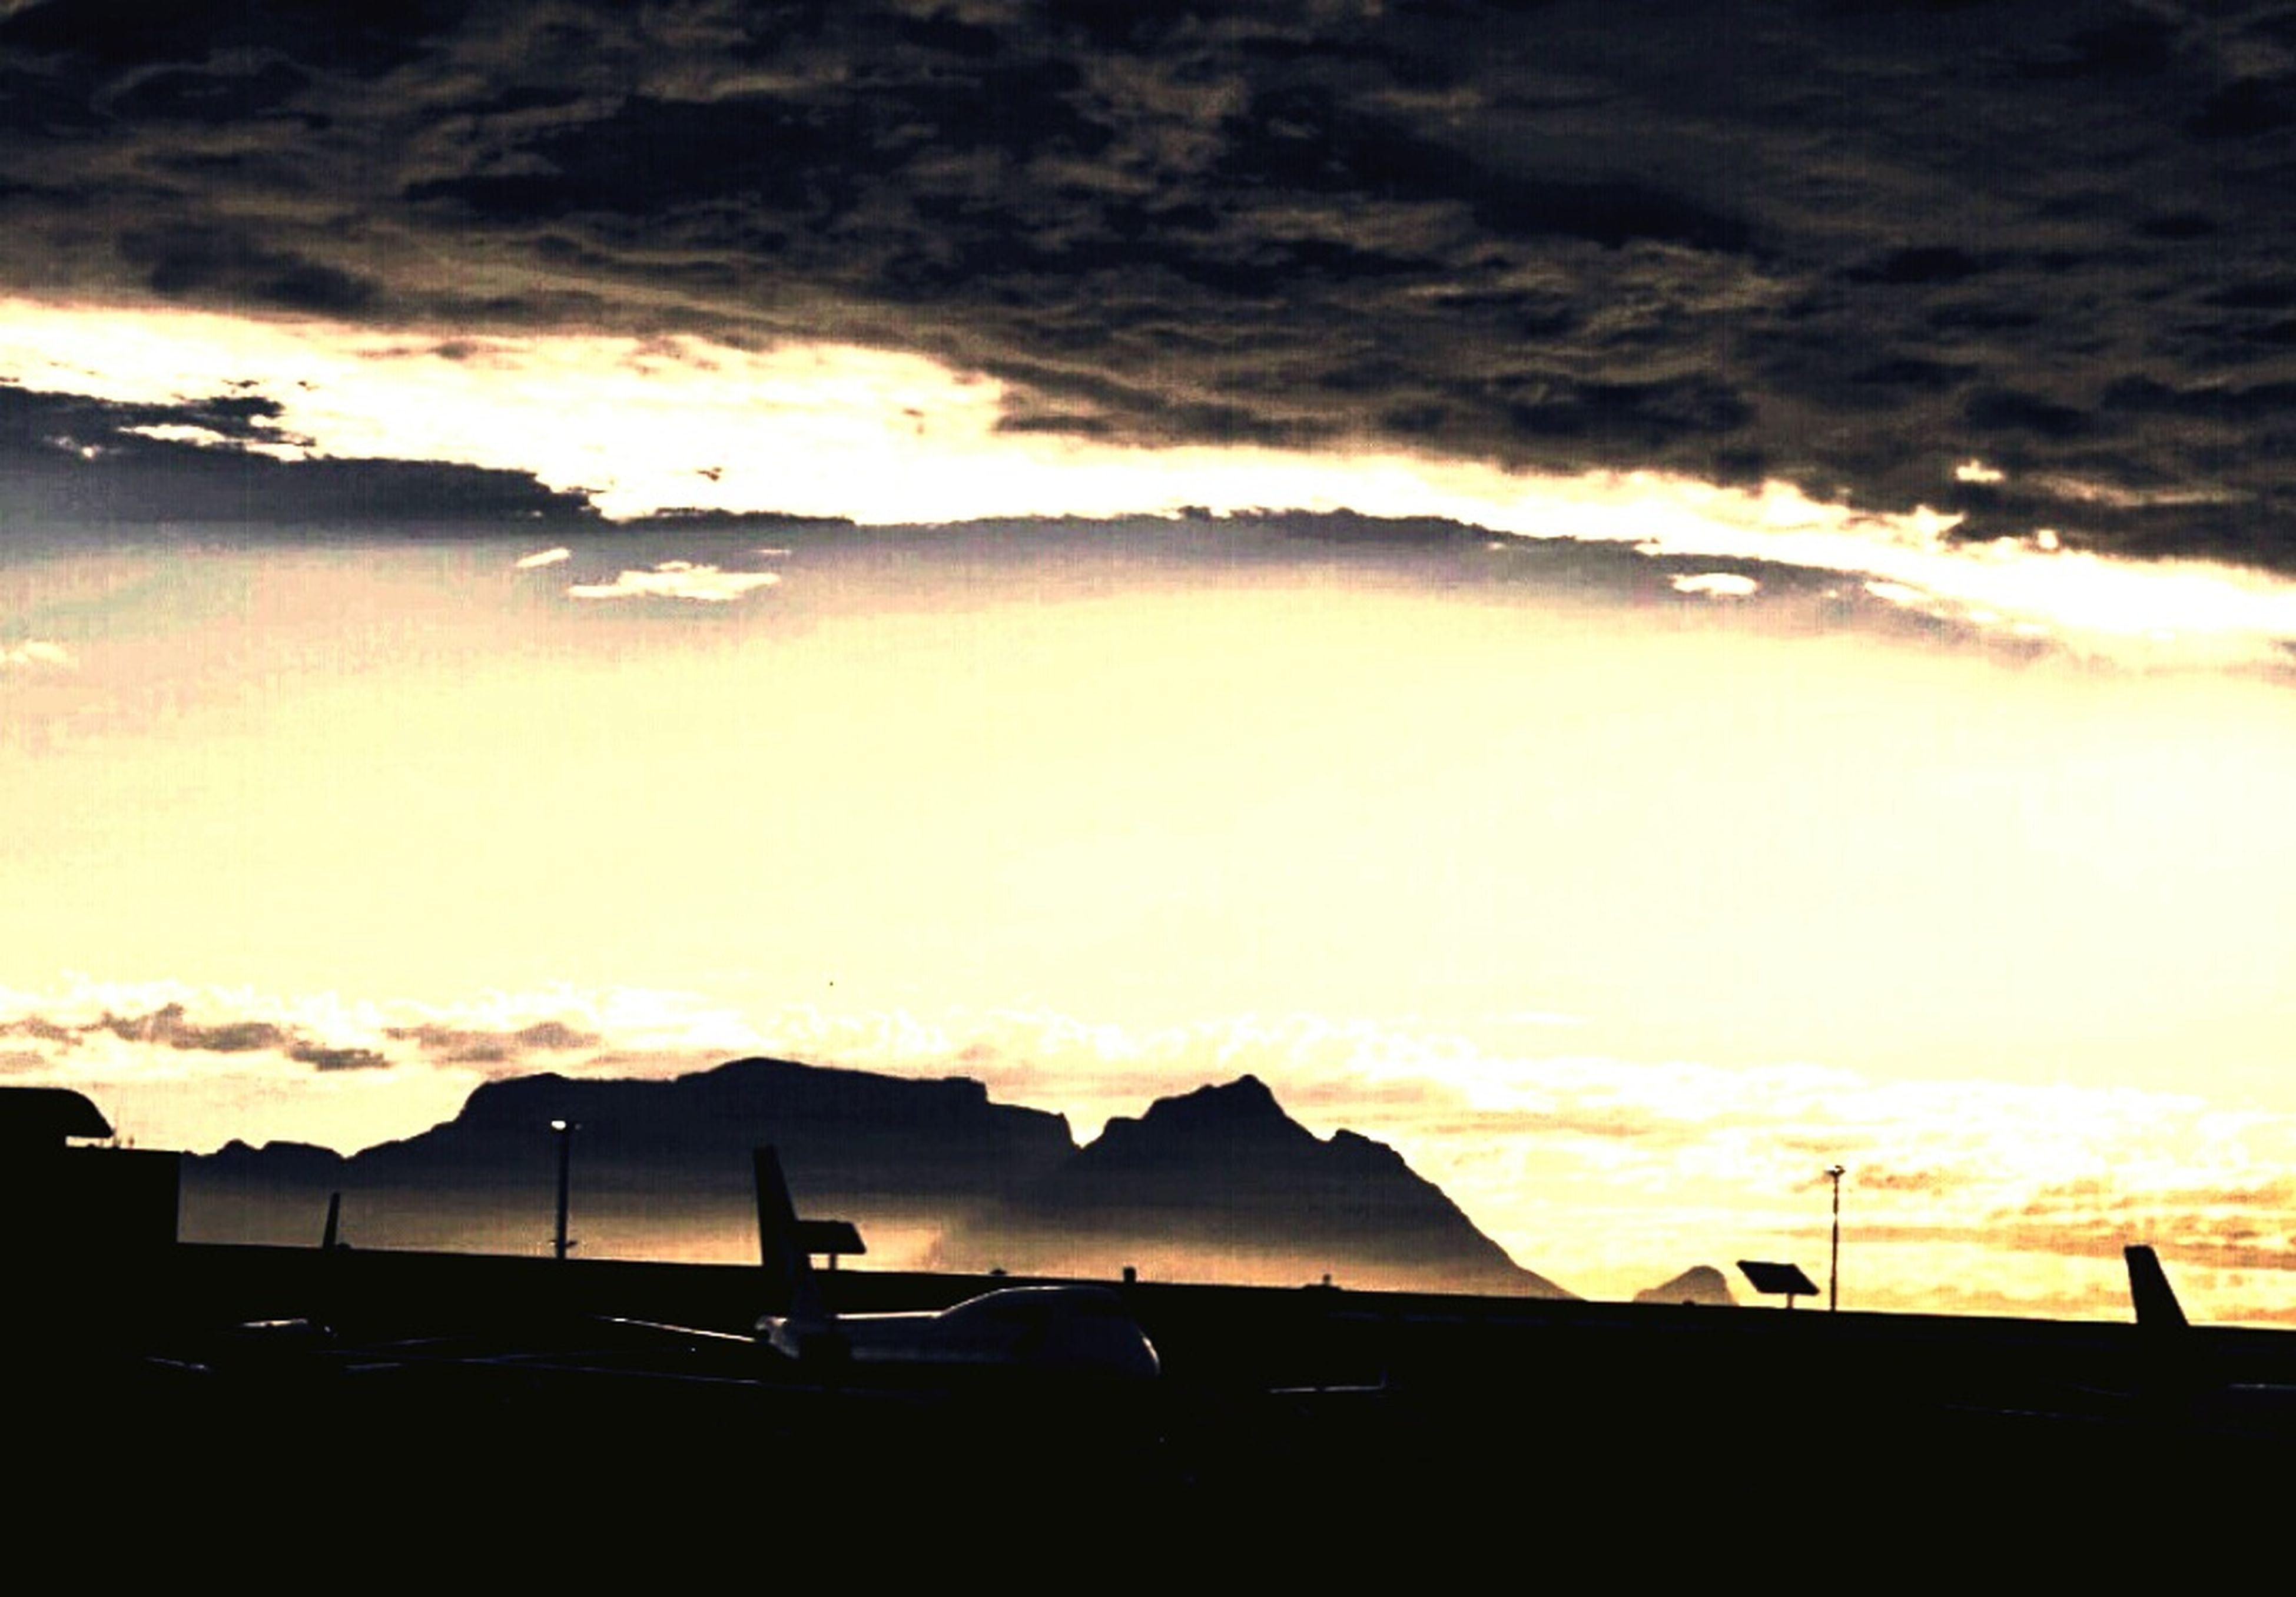 sunset, sky, cloud - sky, silhouette, scenics, cloudy, beauty in nature, mountain, dramatic sky, weather, orange color, cloud, tranquil scene, dusk, nature, tranquility, transportation, idyllic, sea, mode of transport